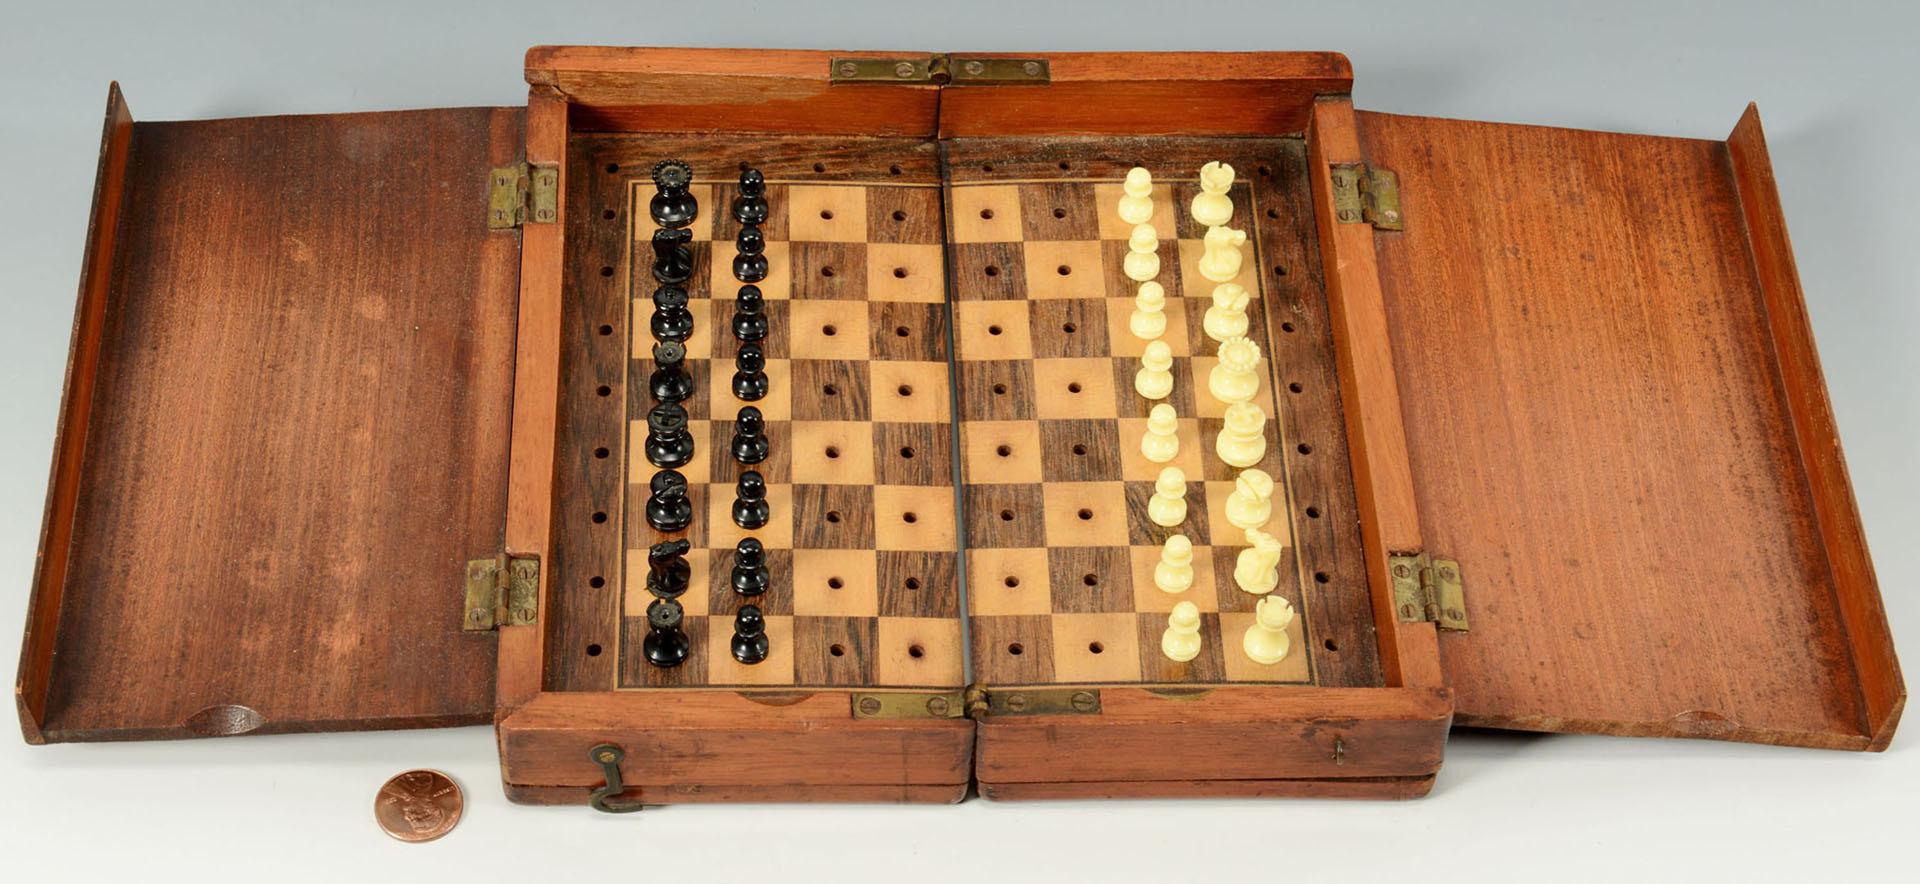 Lot 680: Folding Travel Chess Set